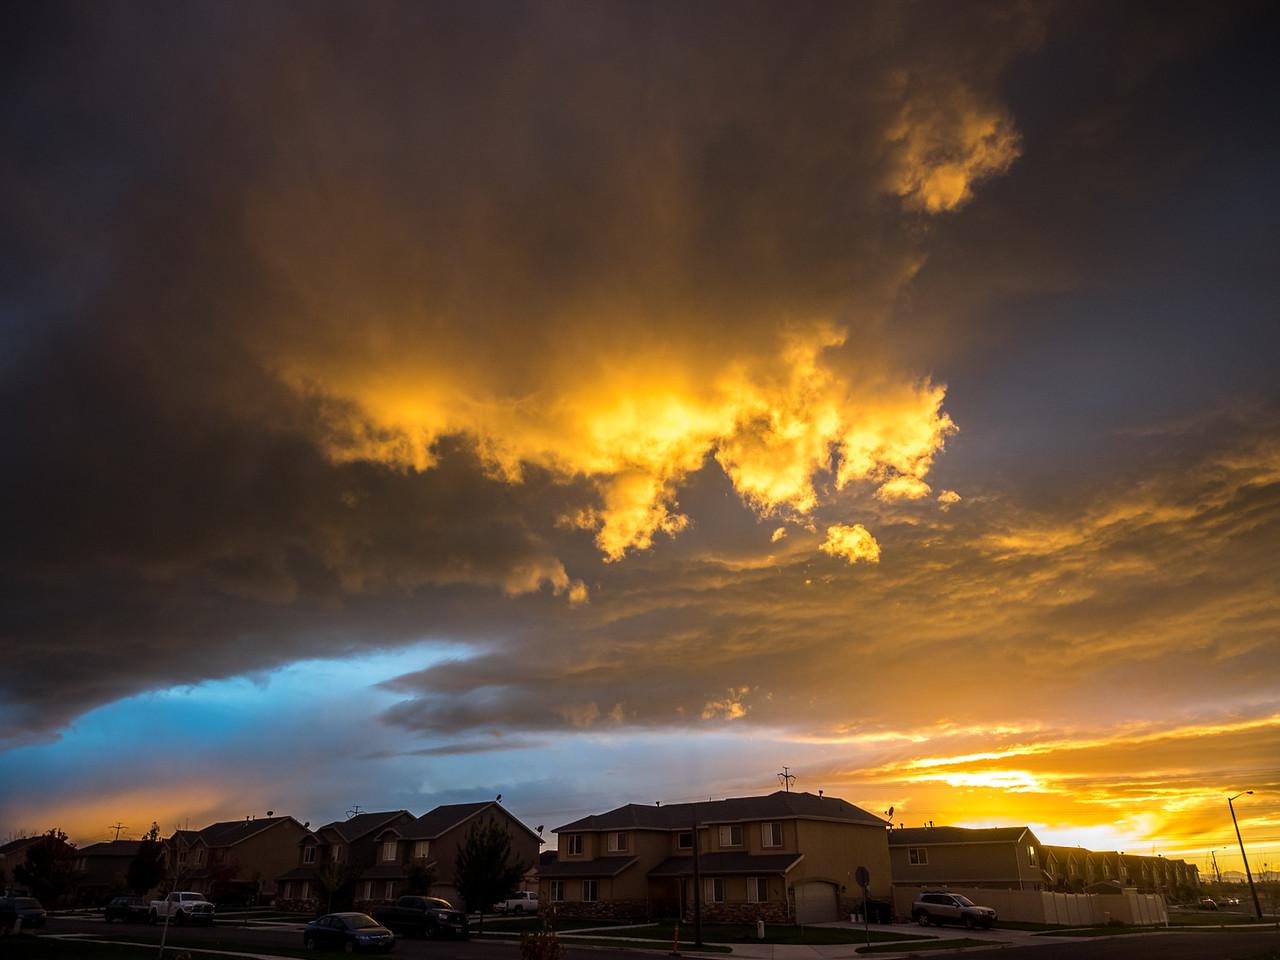 Sunlight, Captured in a Cloud